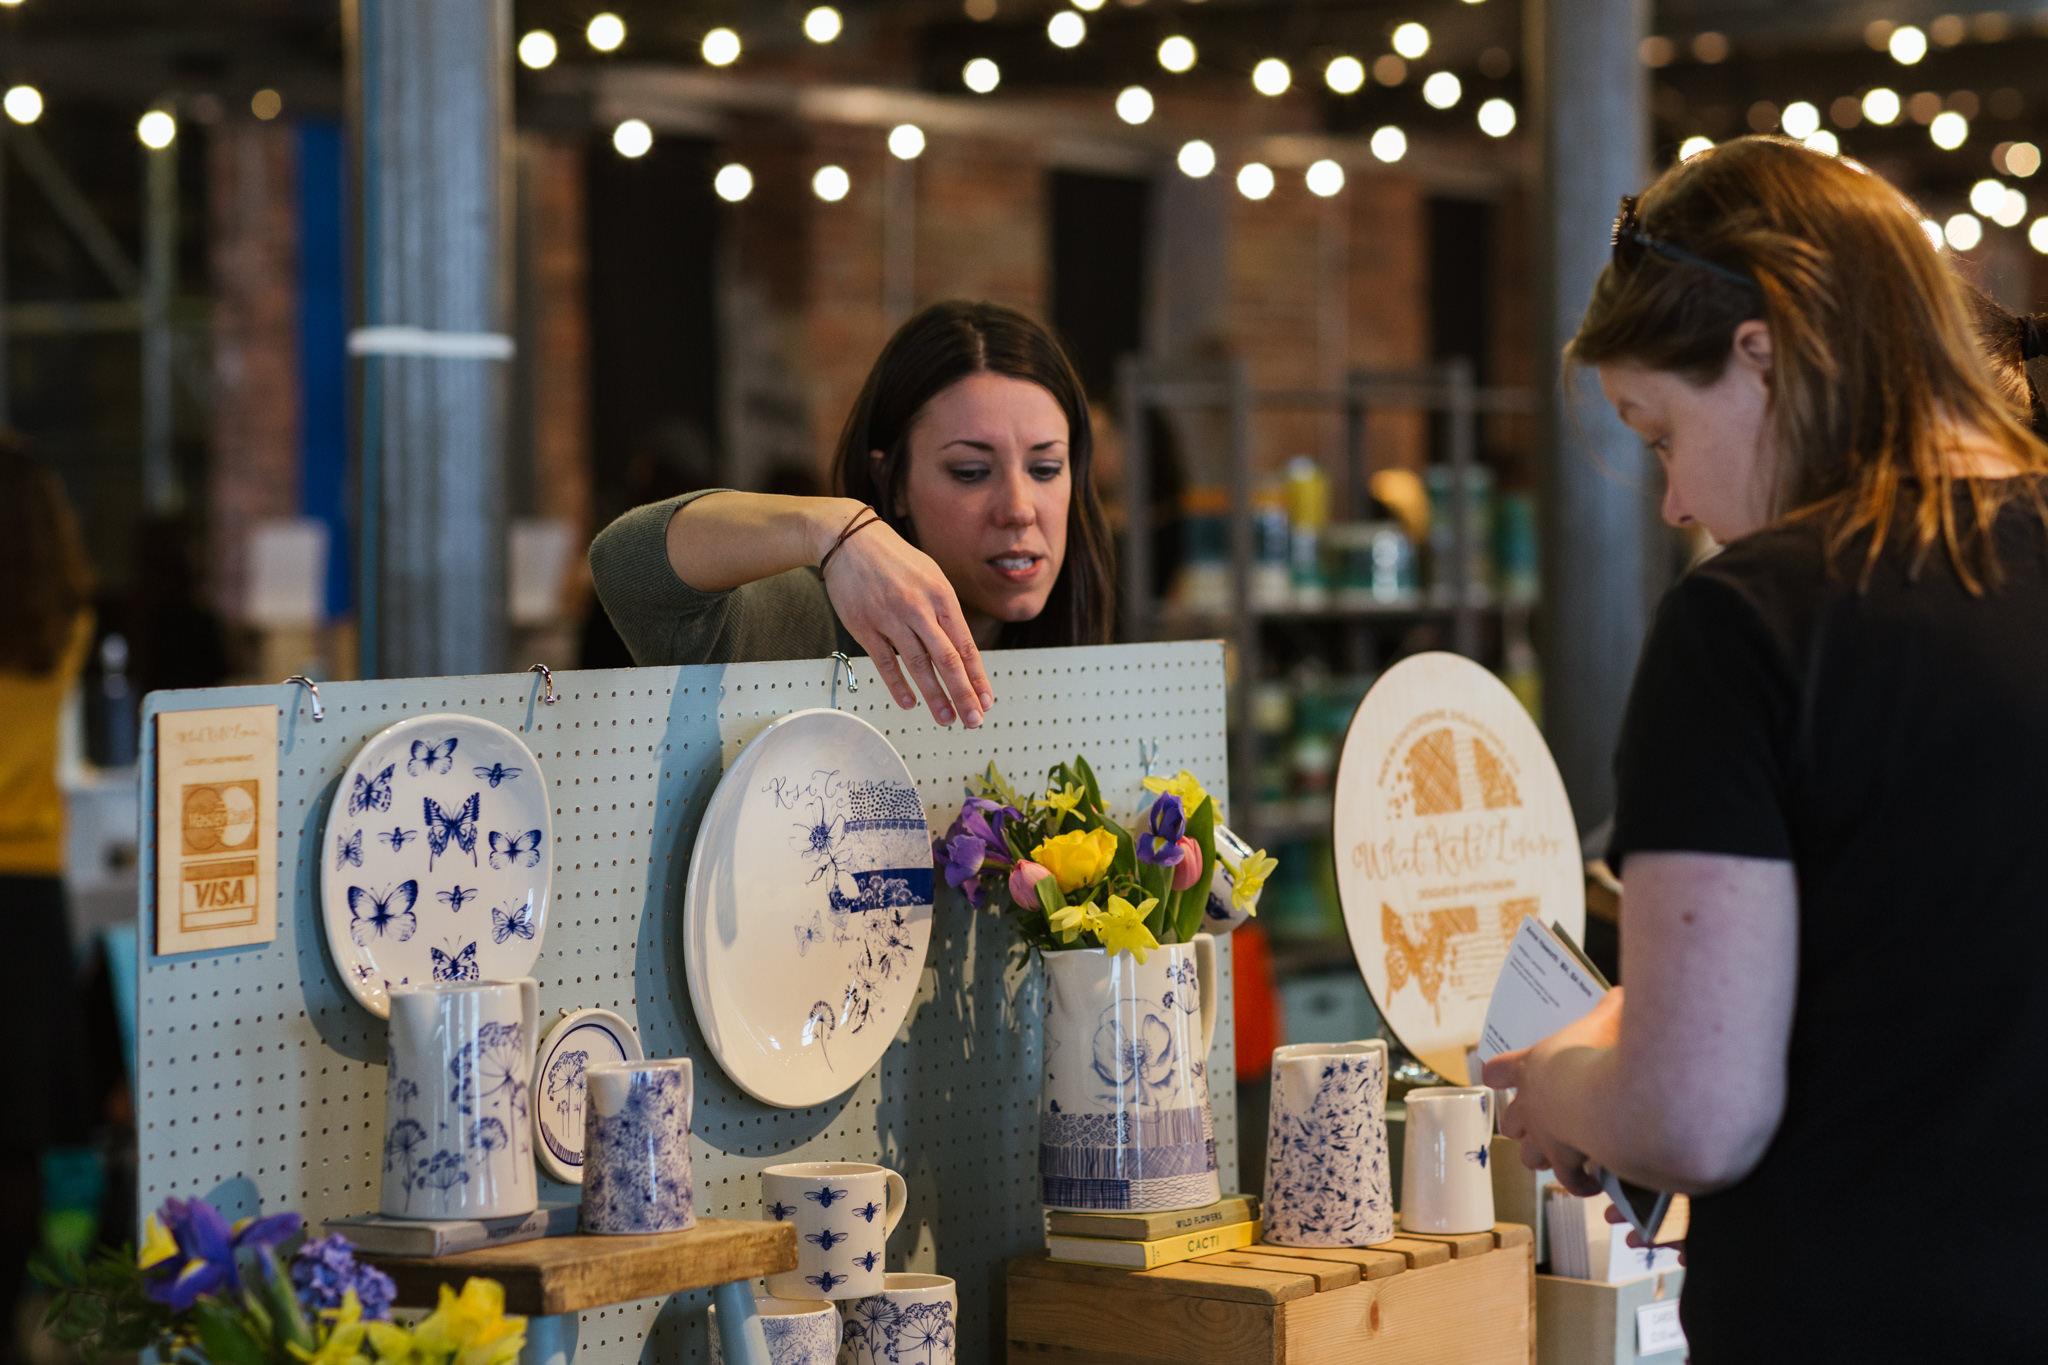 Hepworth-CeramicsFair-Joanne_Crawford-3844.JPG